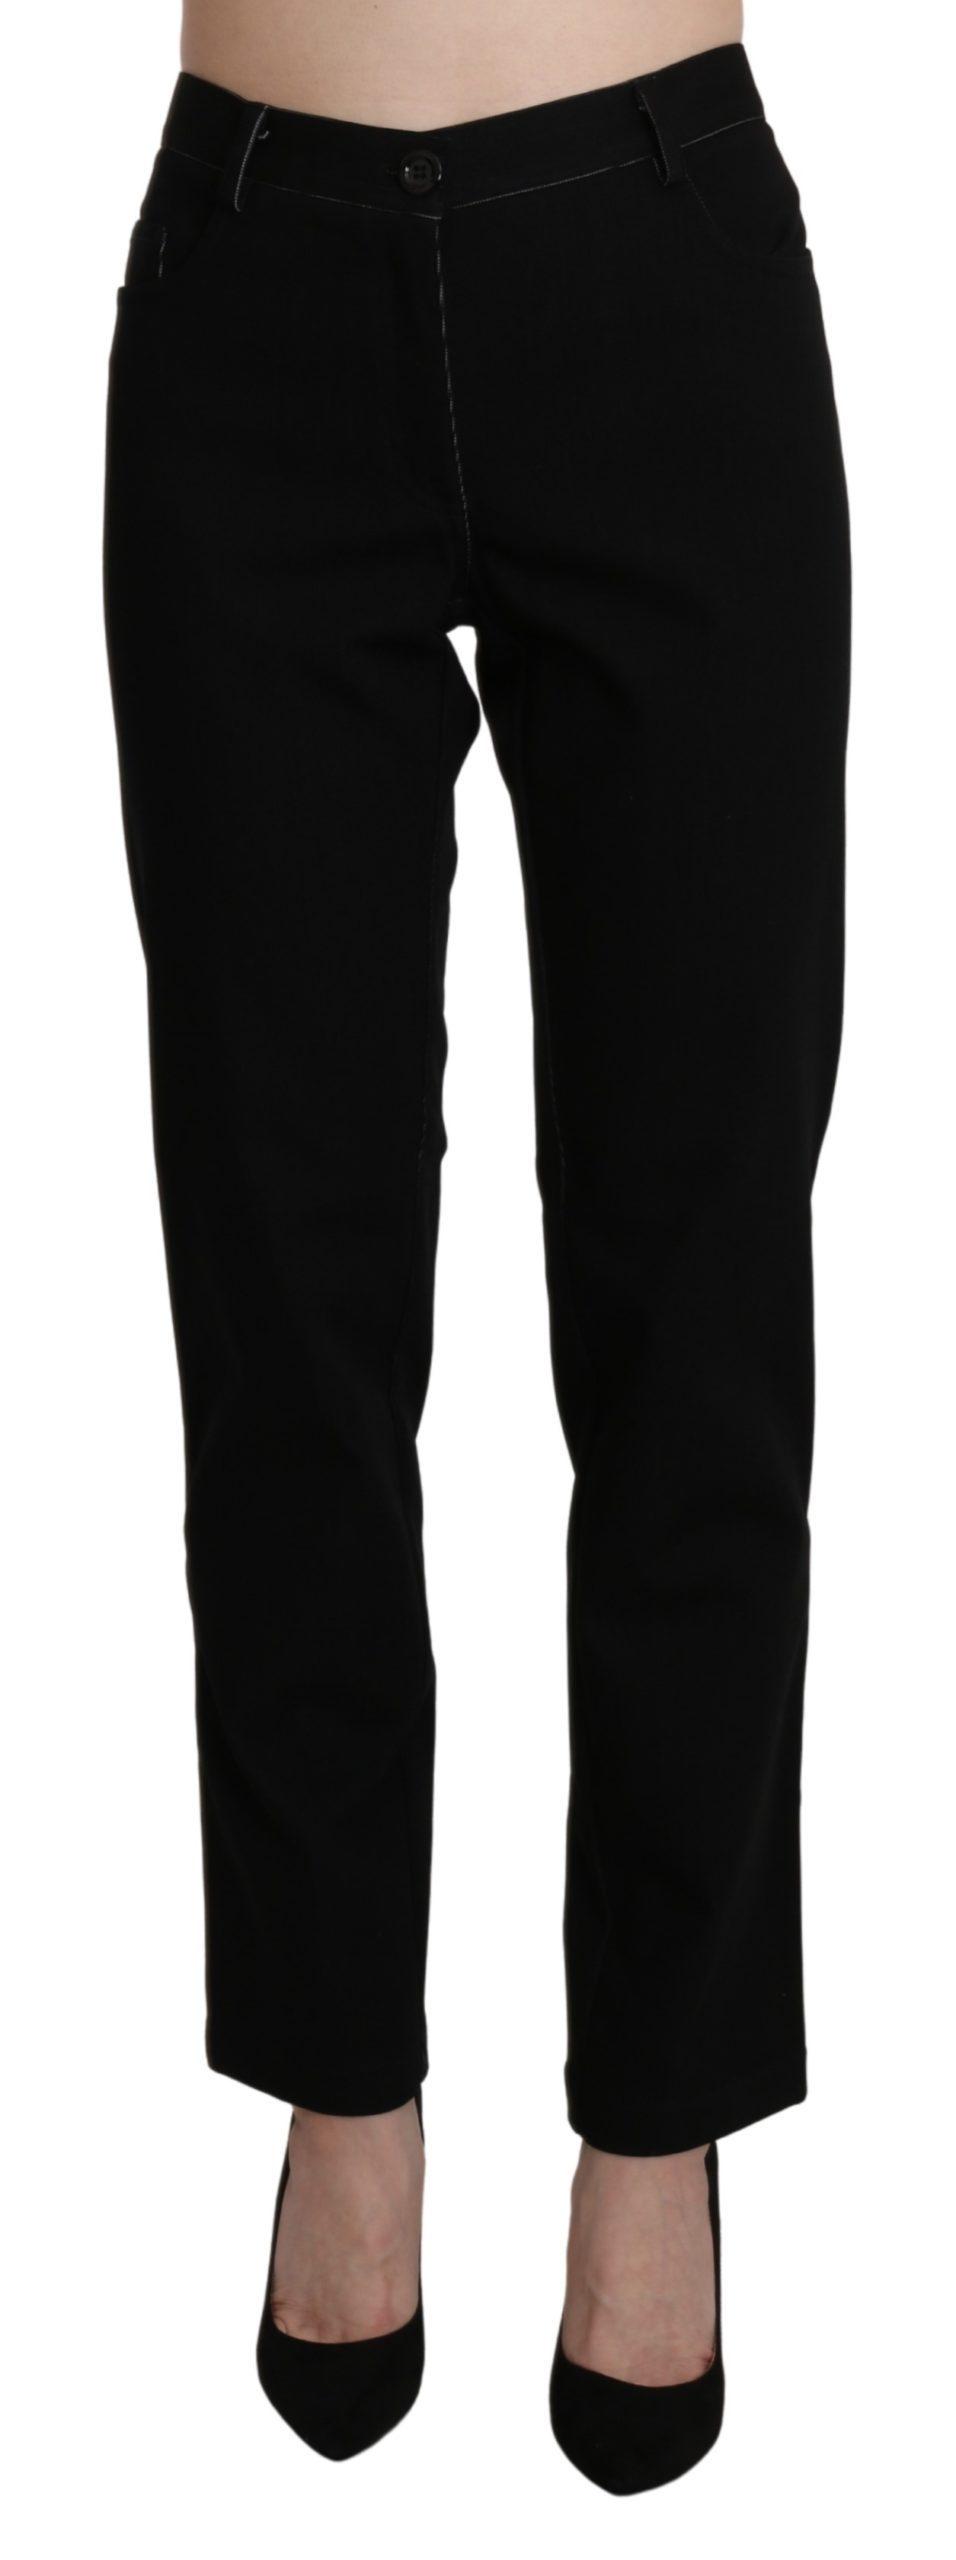 BENCIVENGA Women's High Waist Straight Trouser Black PAN71370-46 - IT48 XXL